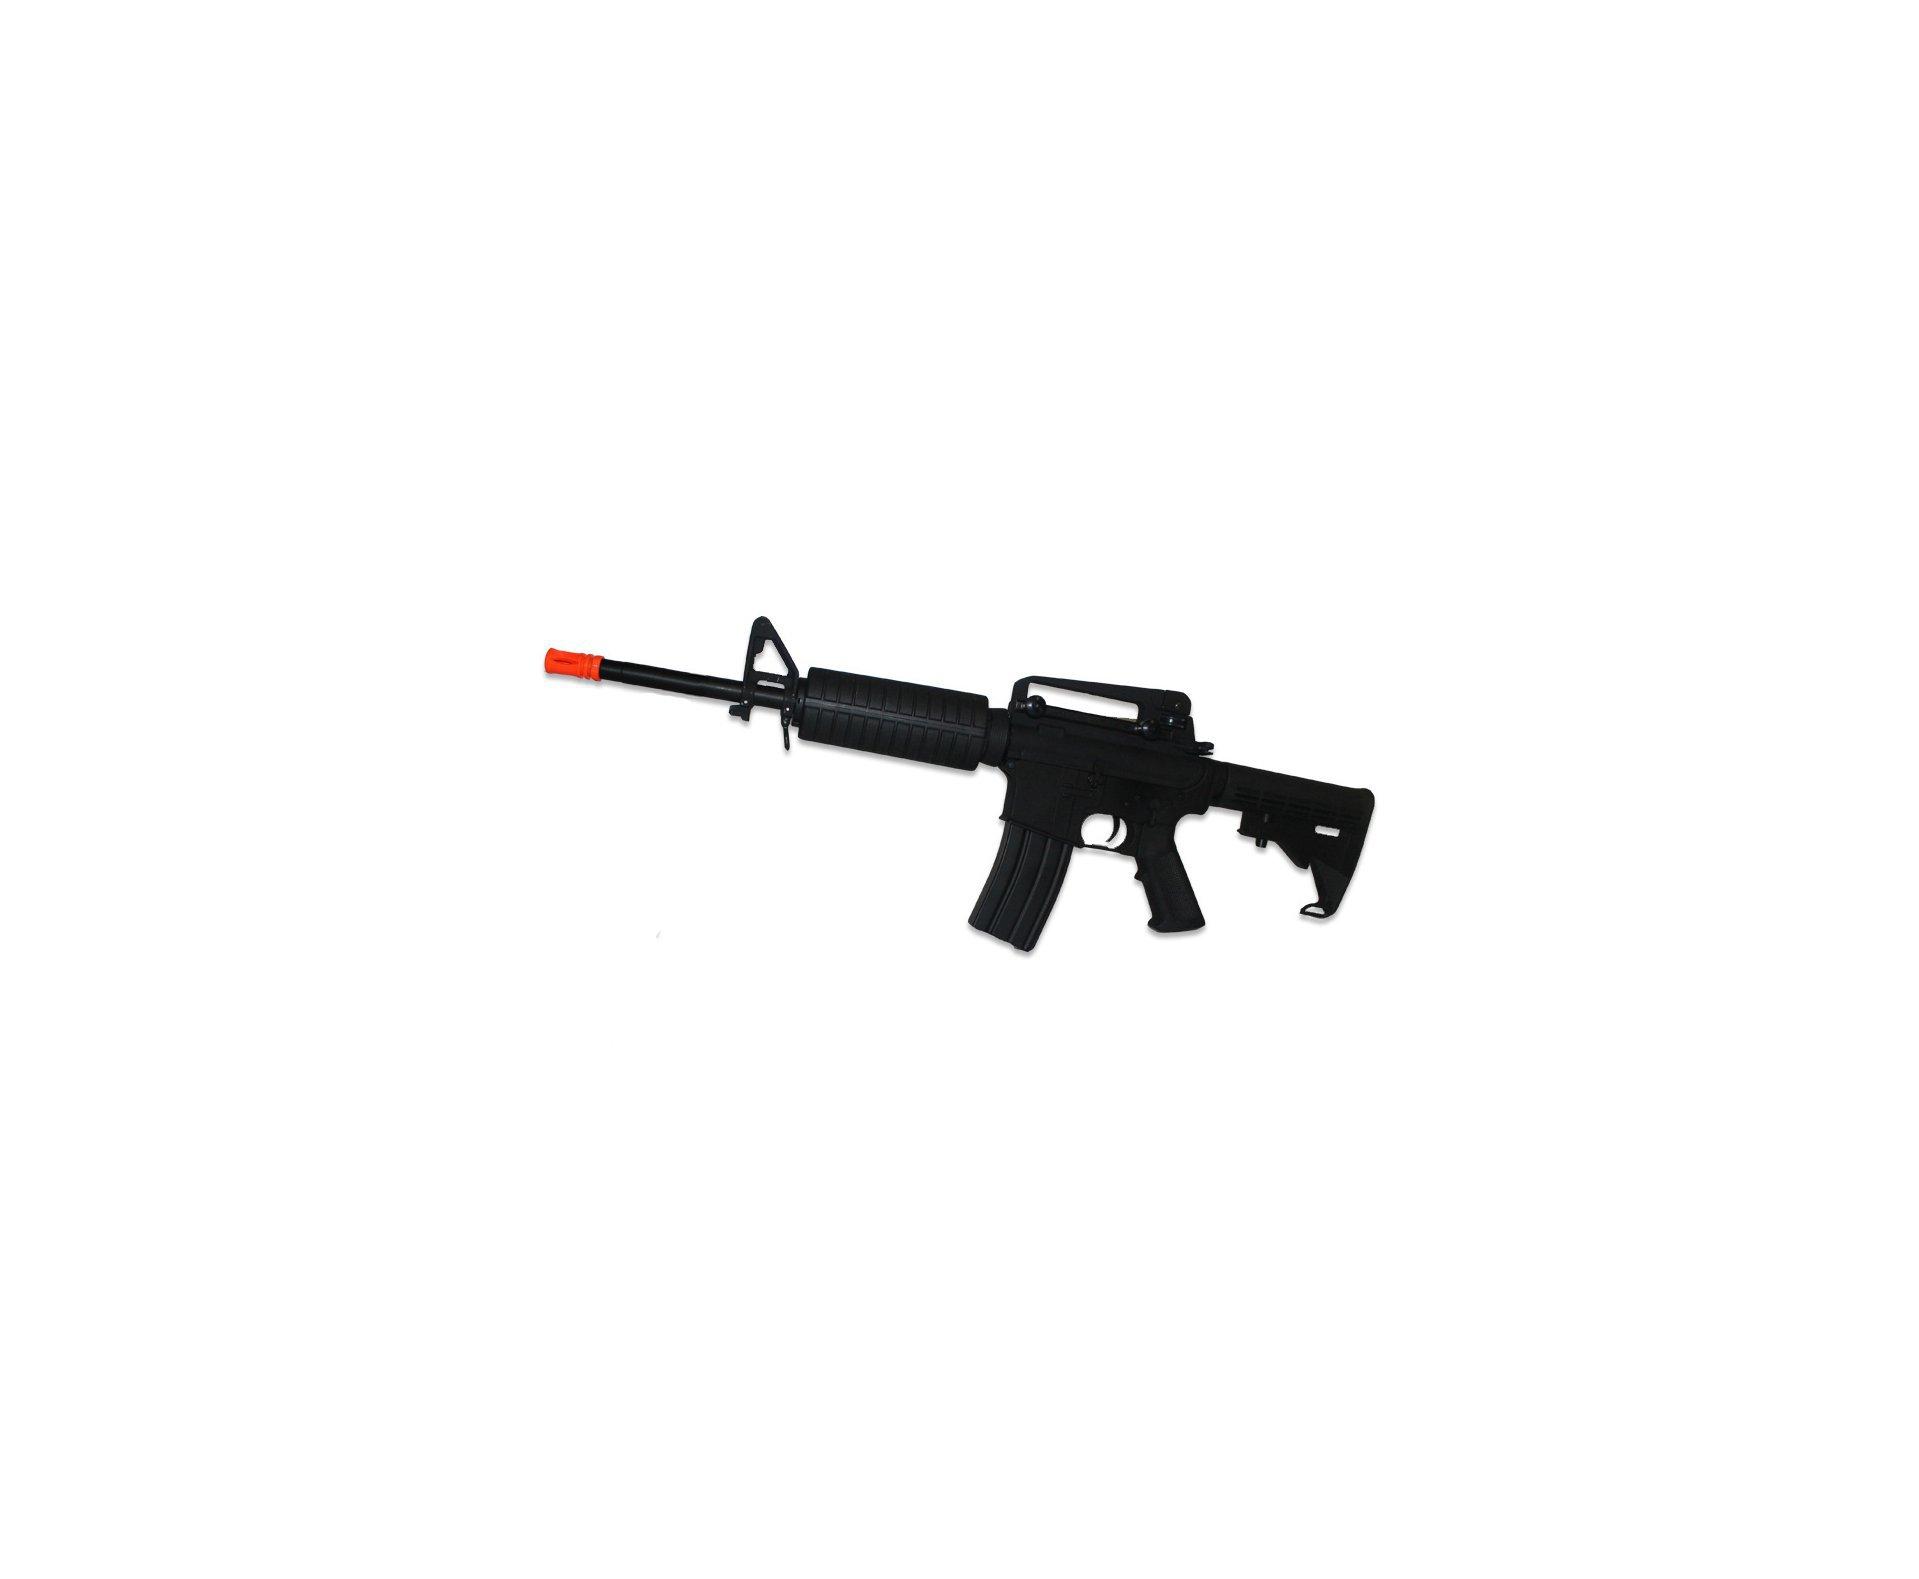 Rifle De Airsoft M4a1 - Full Metal - Cal. 6,0 Mm - Cyma + óculos Swiss Arms Tactical +  4000 Esferas Bb King